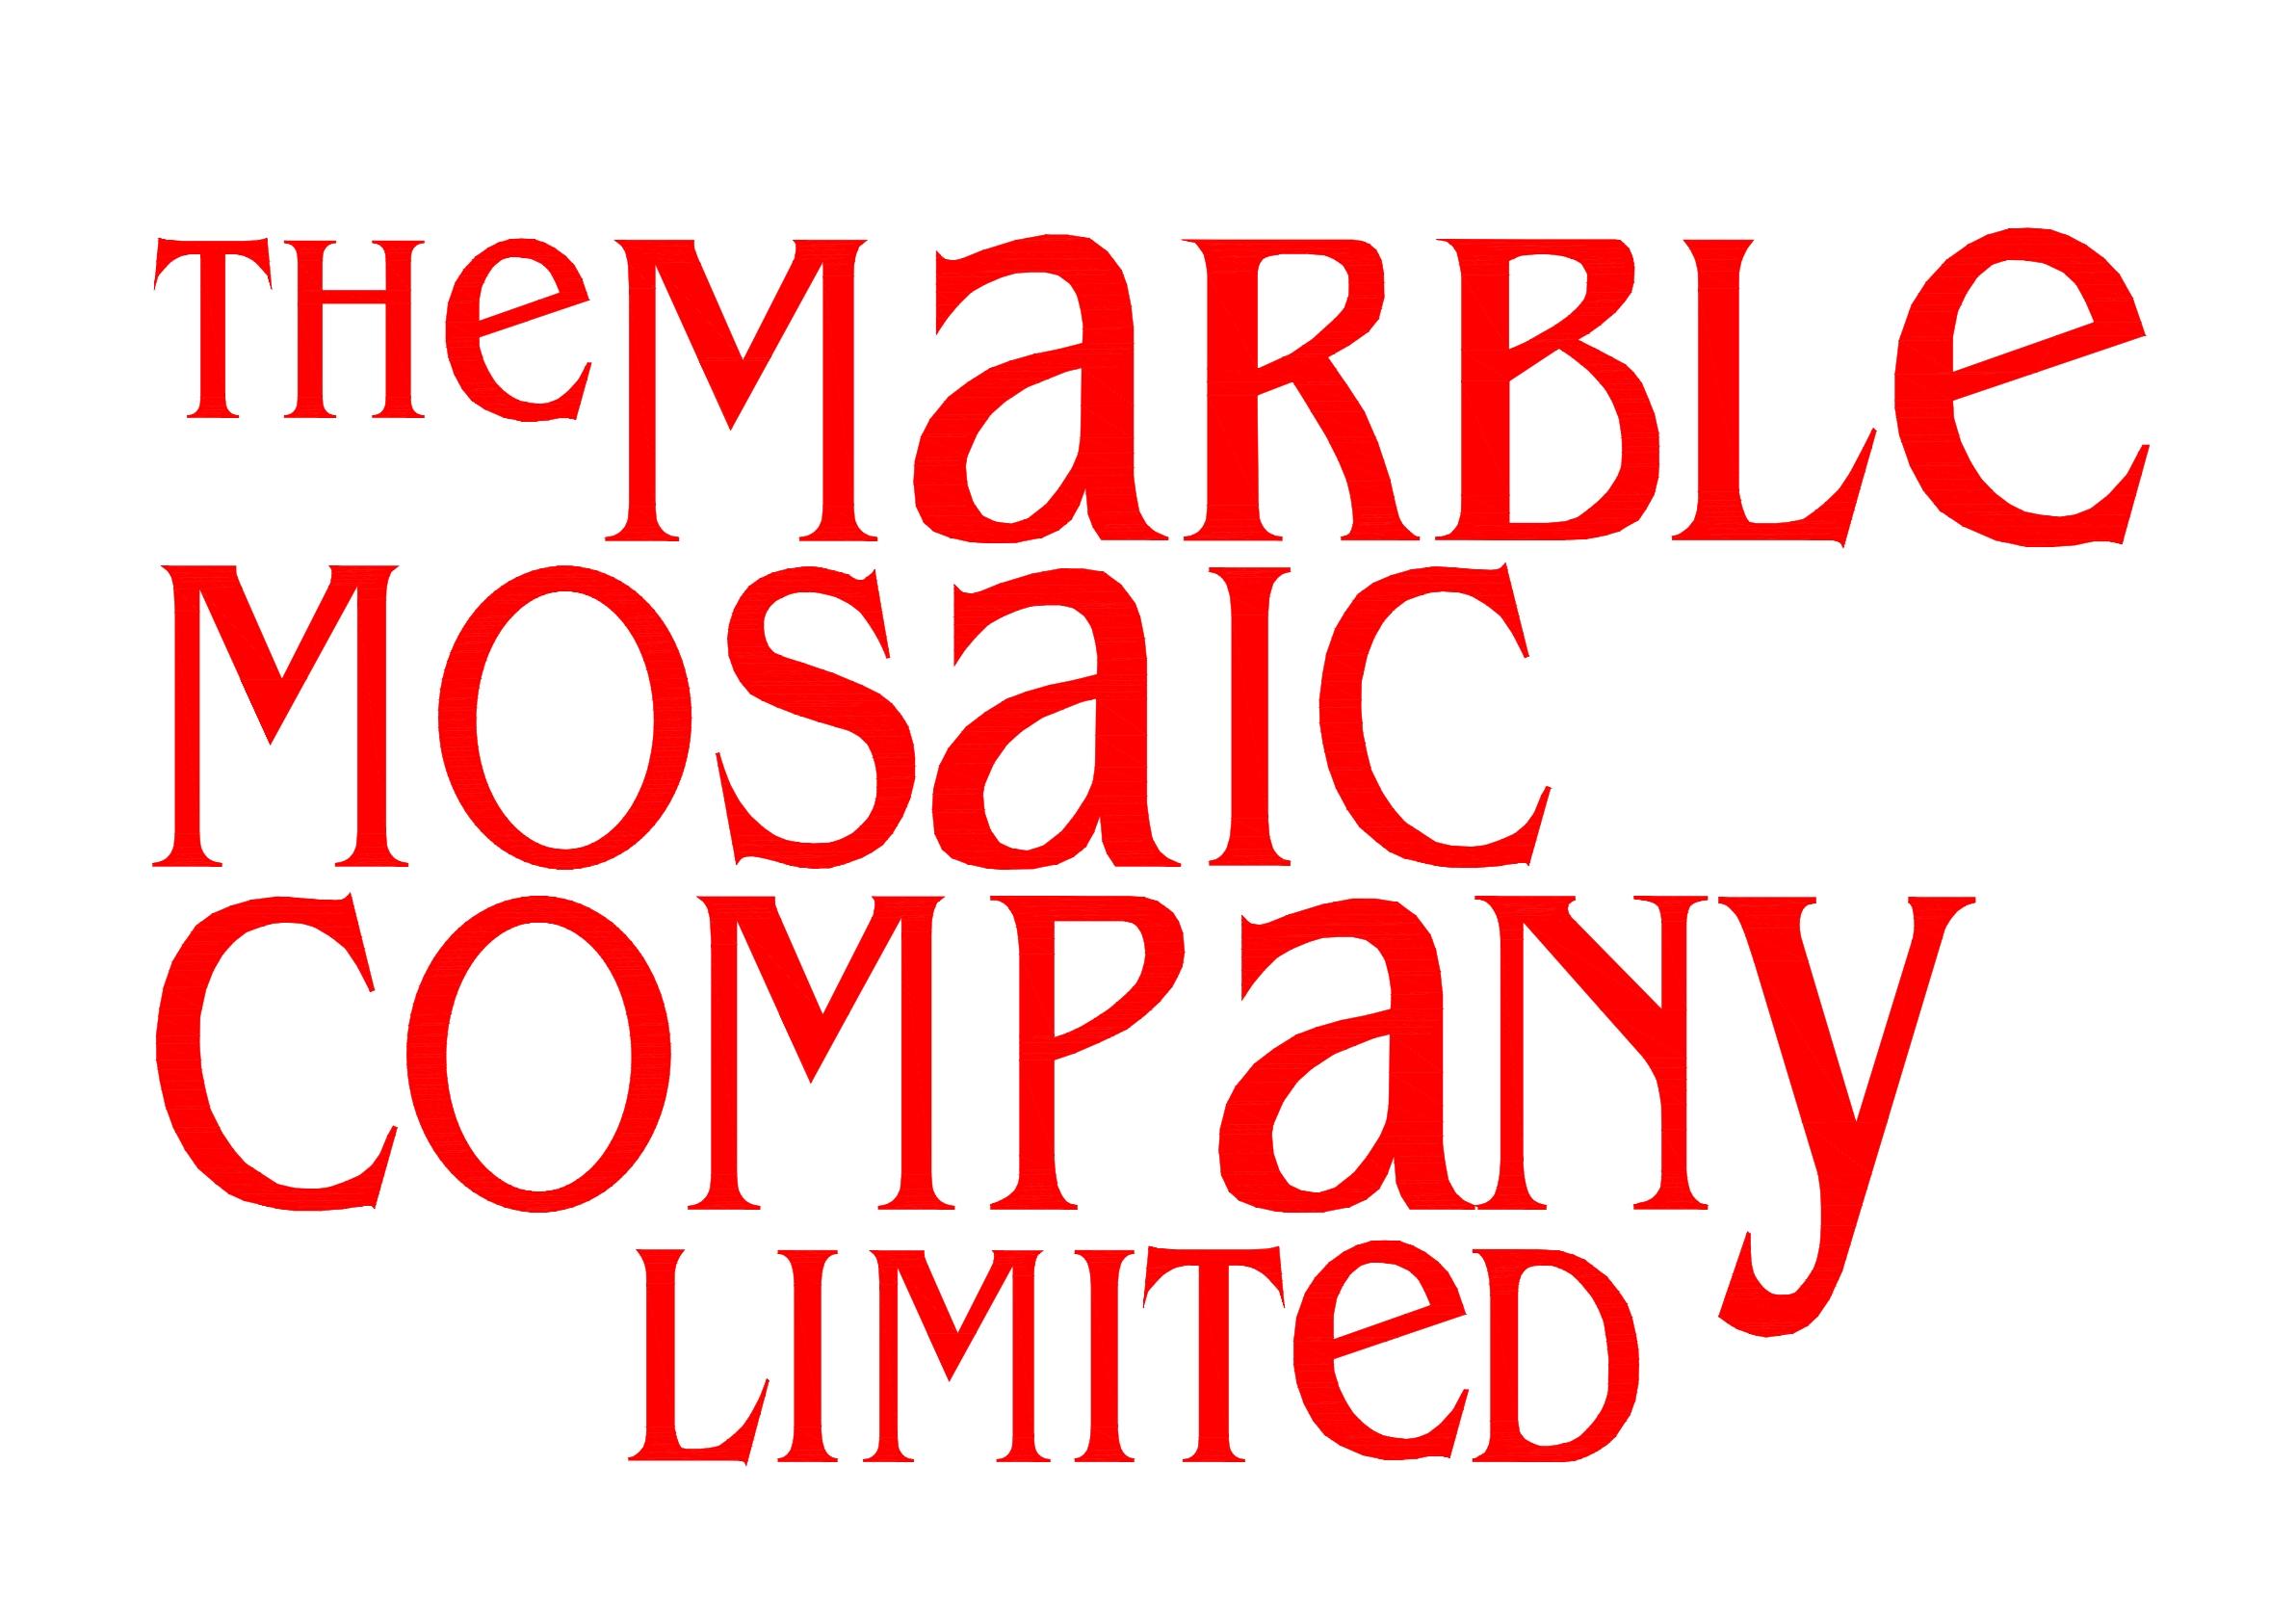 The Marble Mosaic Company